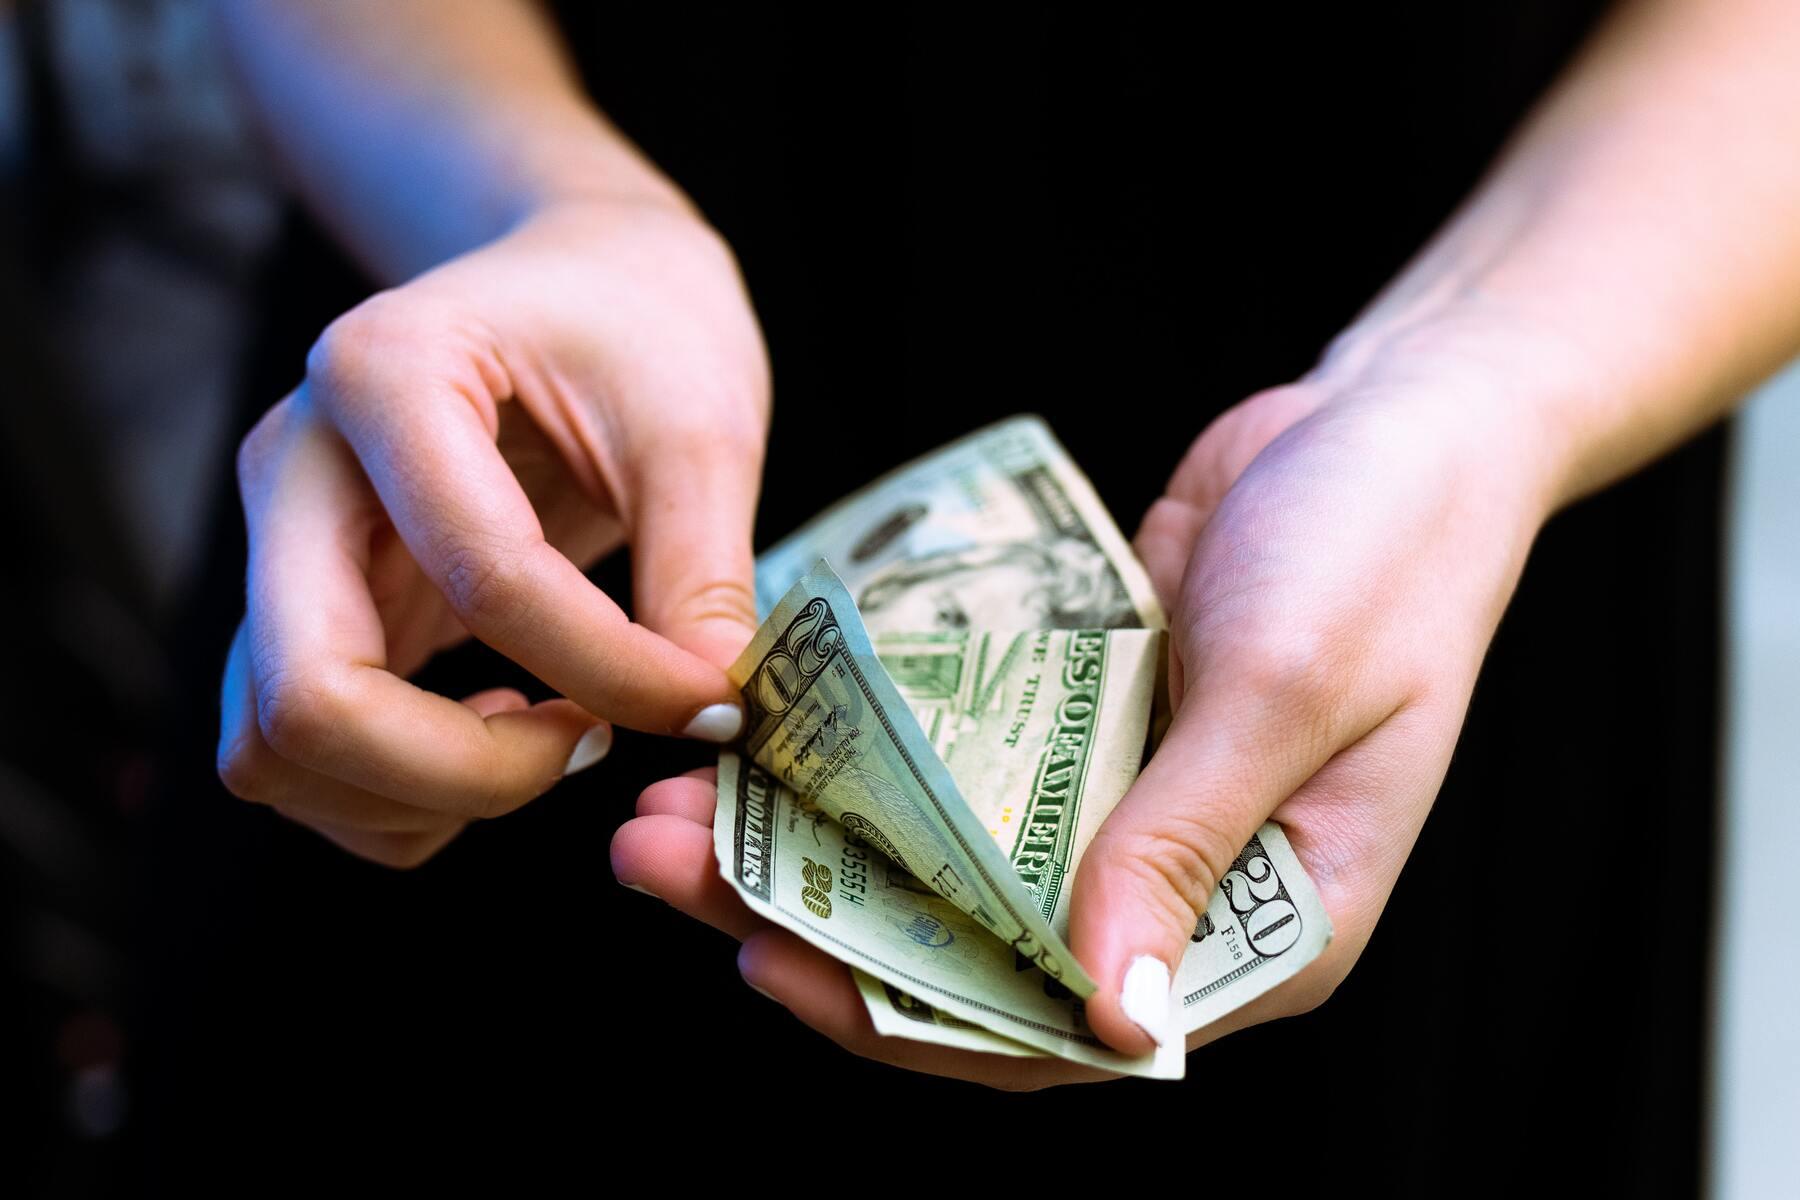 Photo of woman's hands holding dollar bills